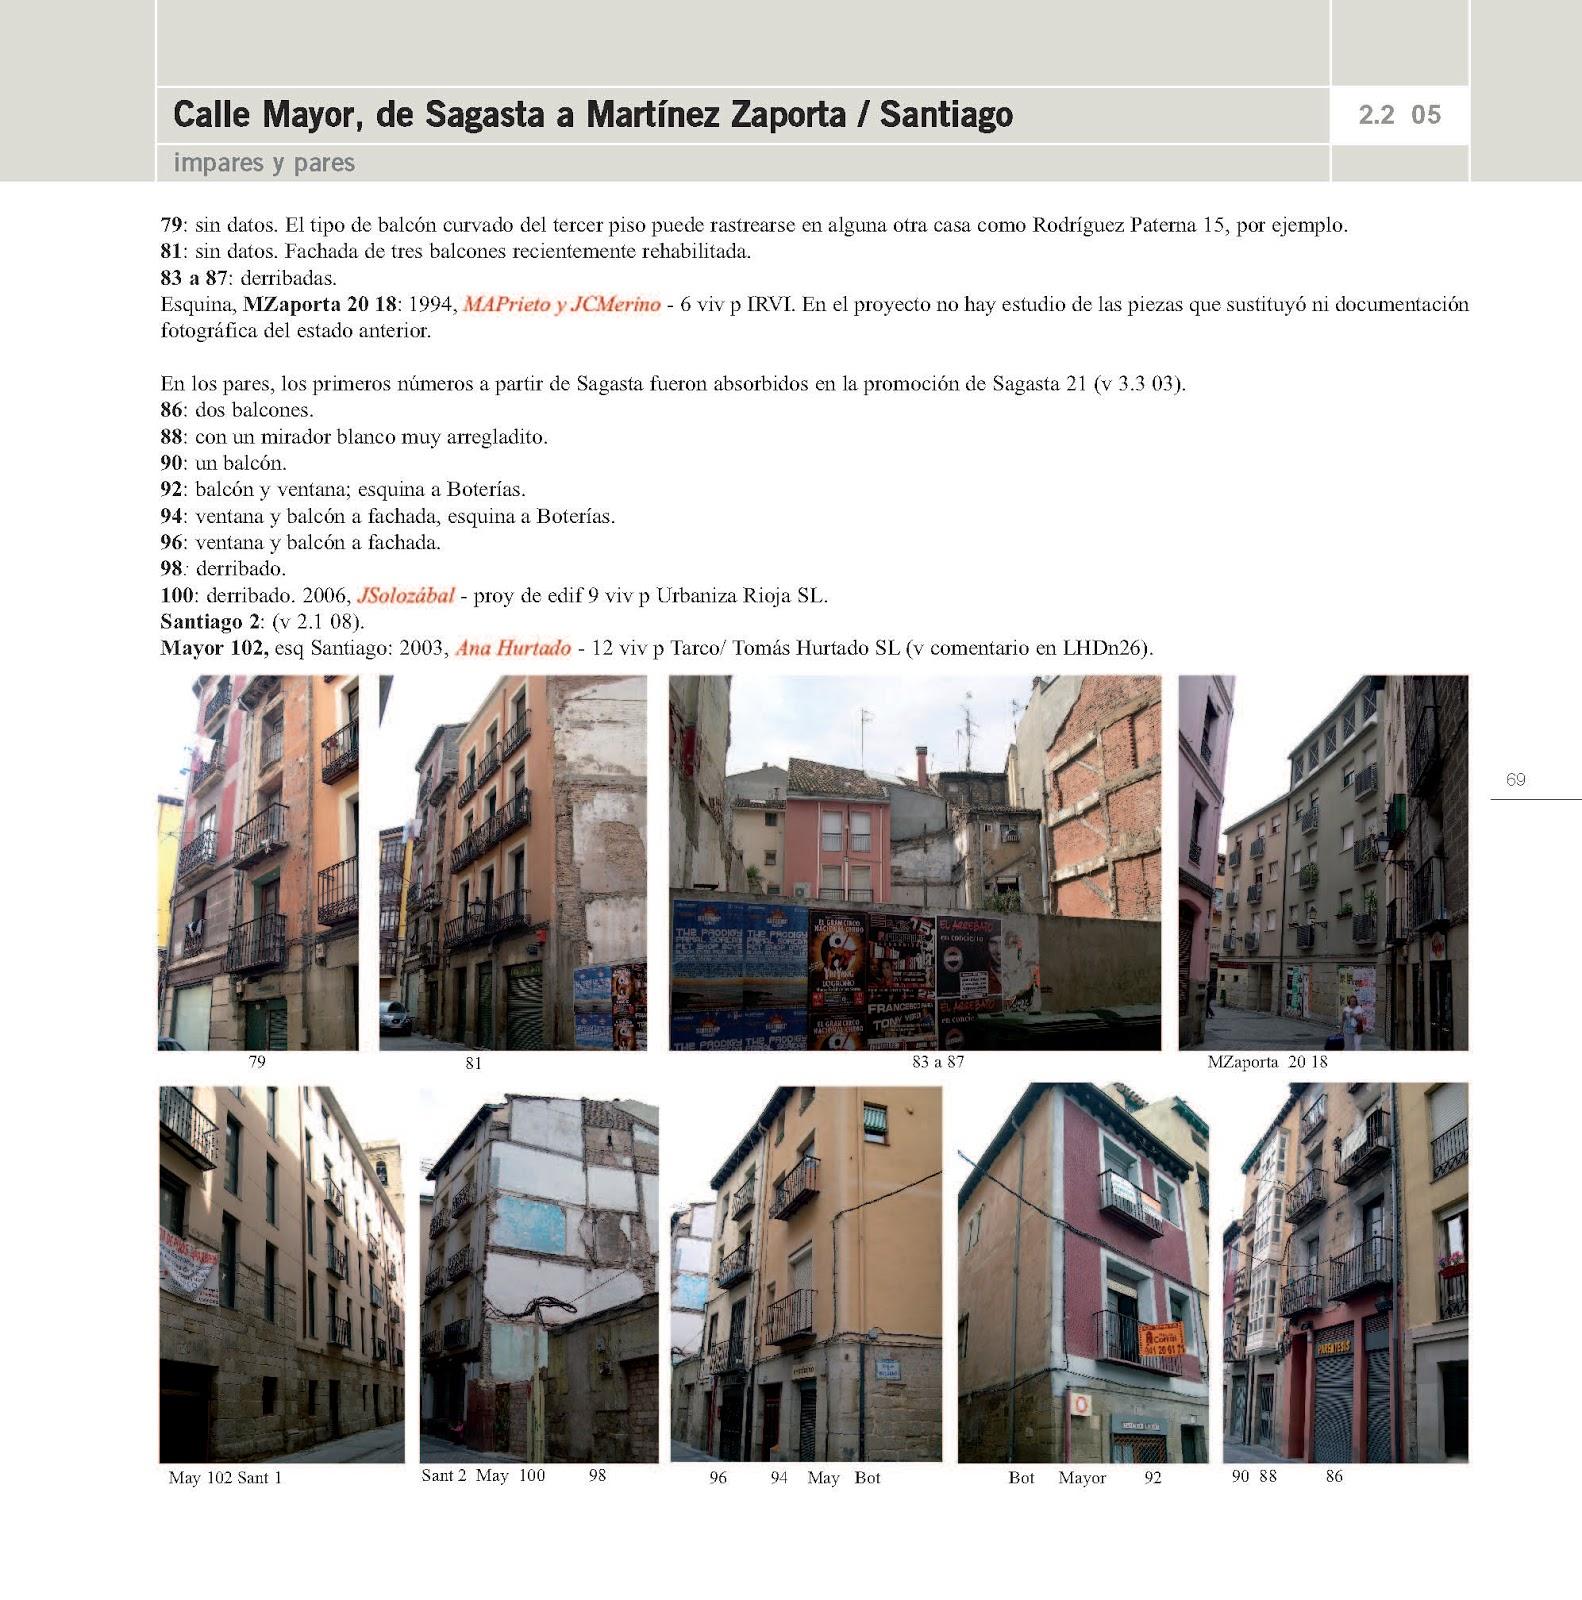 Guia de arquitectura de logro o paginas 2 2 05 calle for Paginas arquitectura